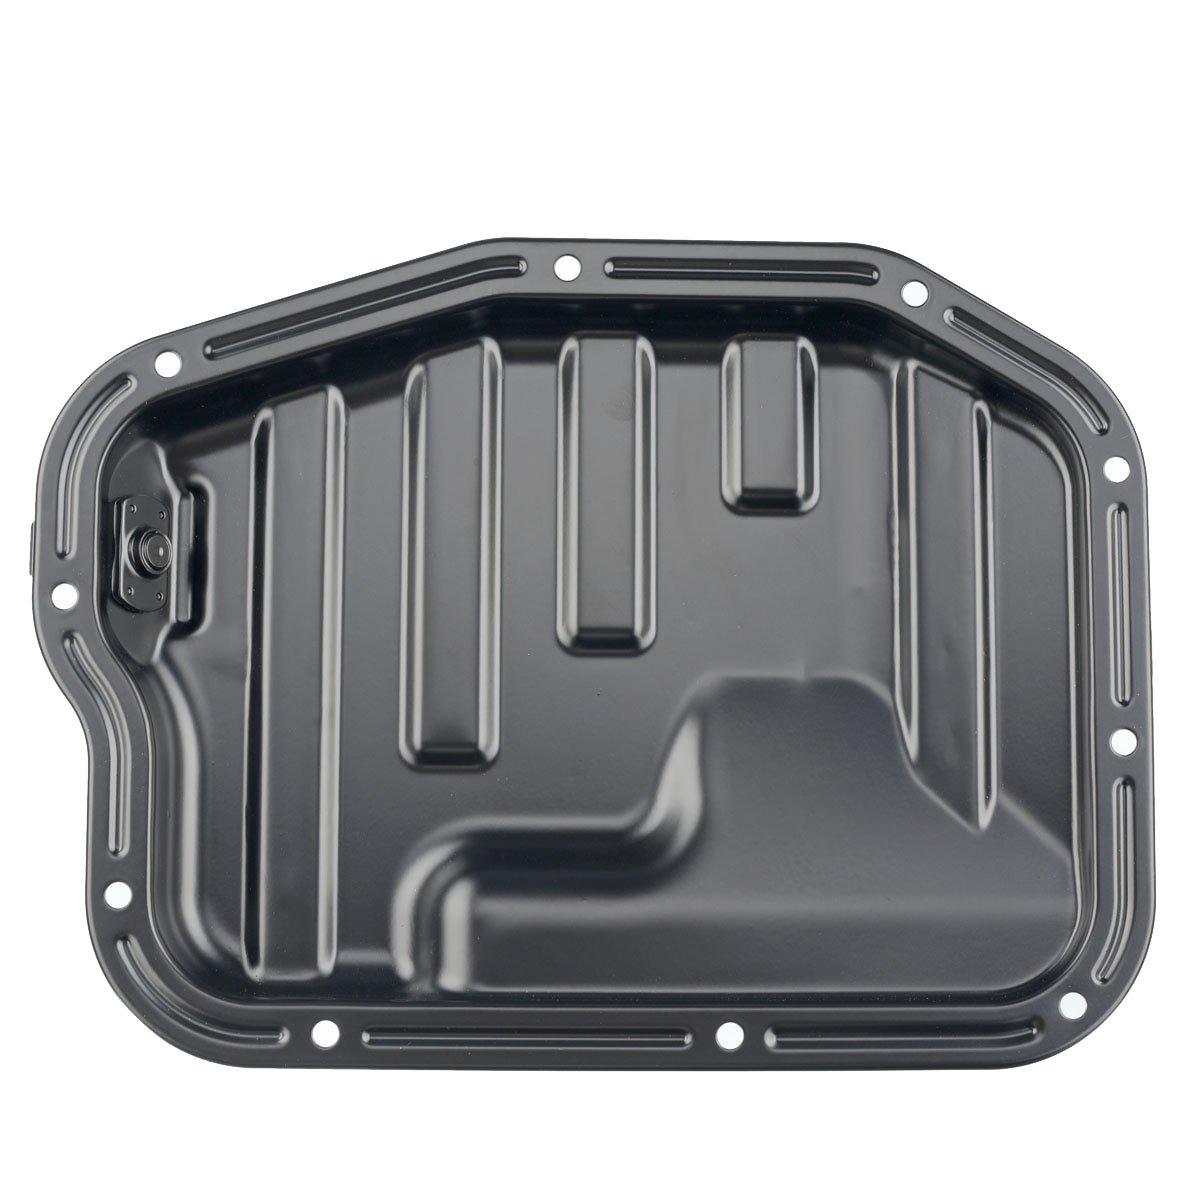 A-Premium Engine Oil pan for Nissan Altima Sentra 2002-2006 2.5L 11110-3Z010